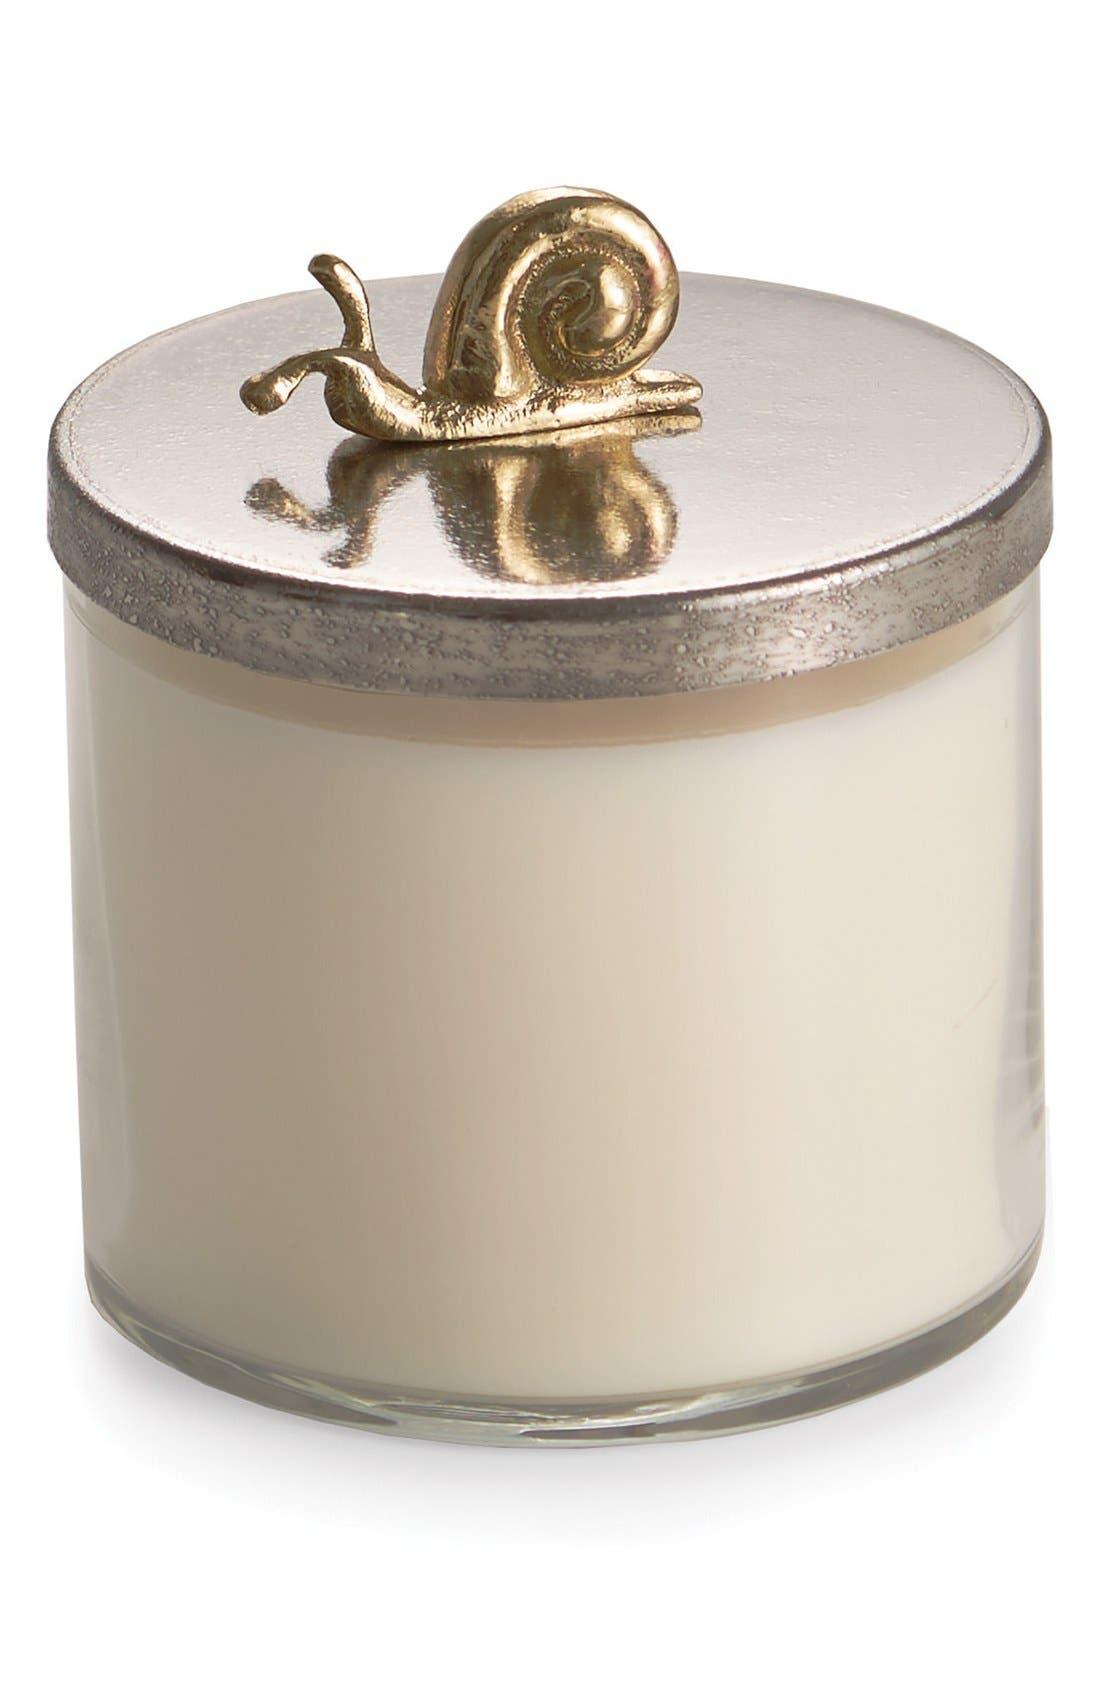 Michael Aram 'Enchanted Garden' Soy Wax Candle